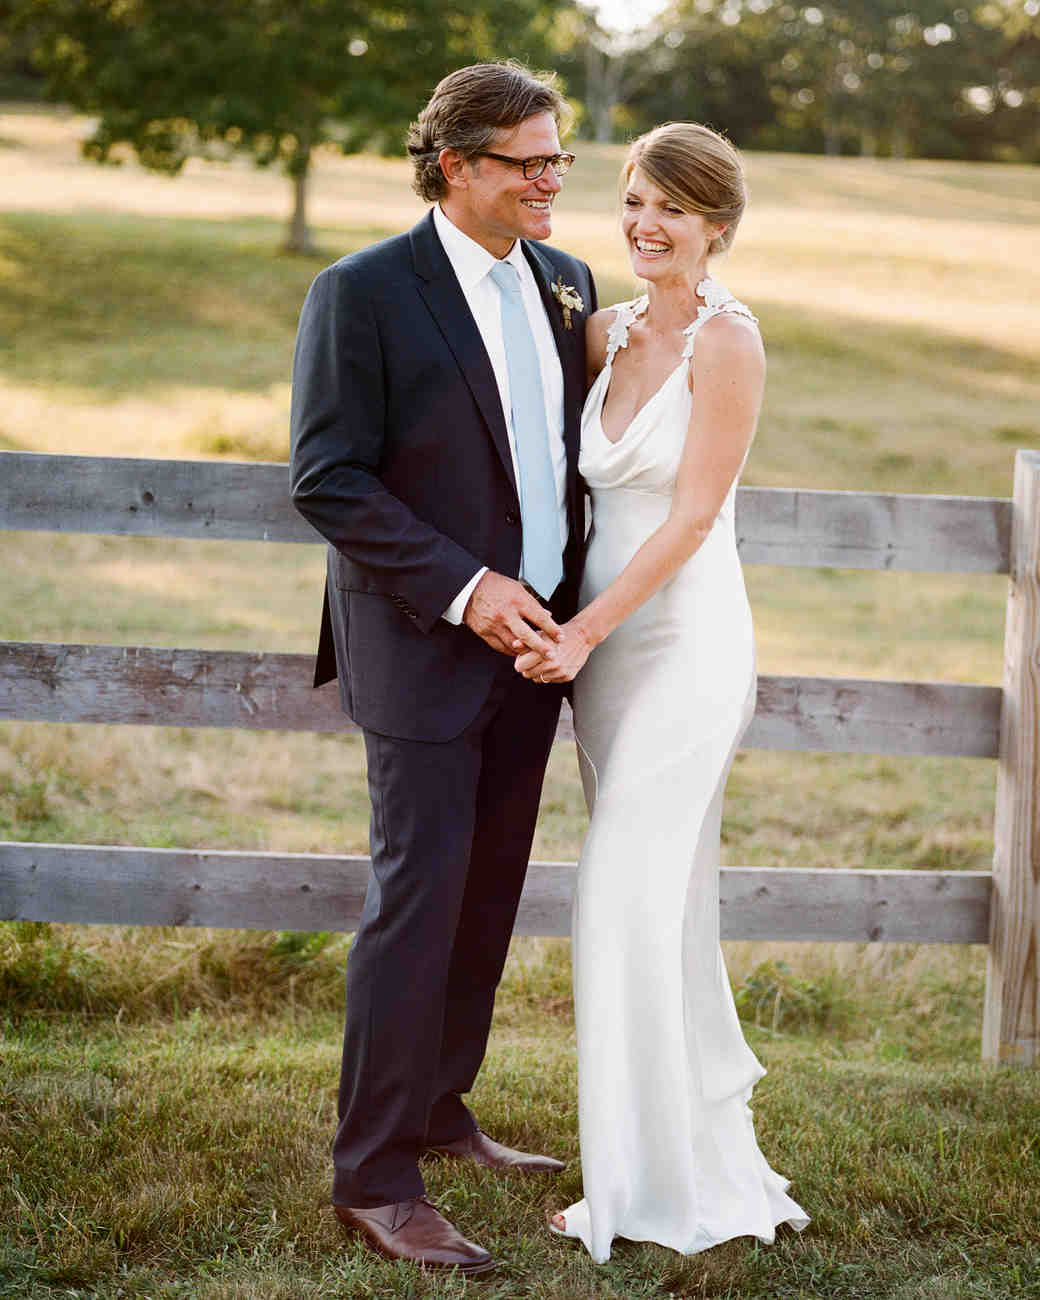 jocelyn-graham-wedding-couple-1157-s111847-0315.jpg